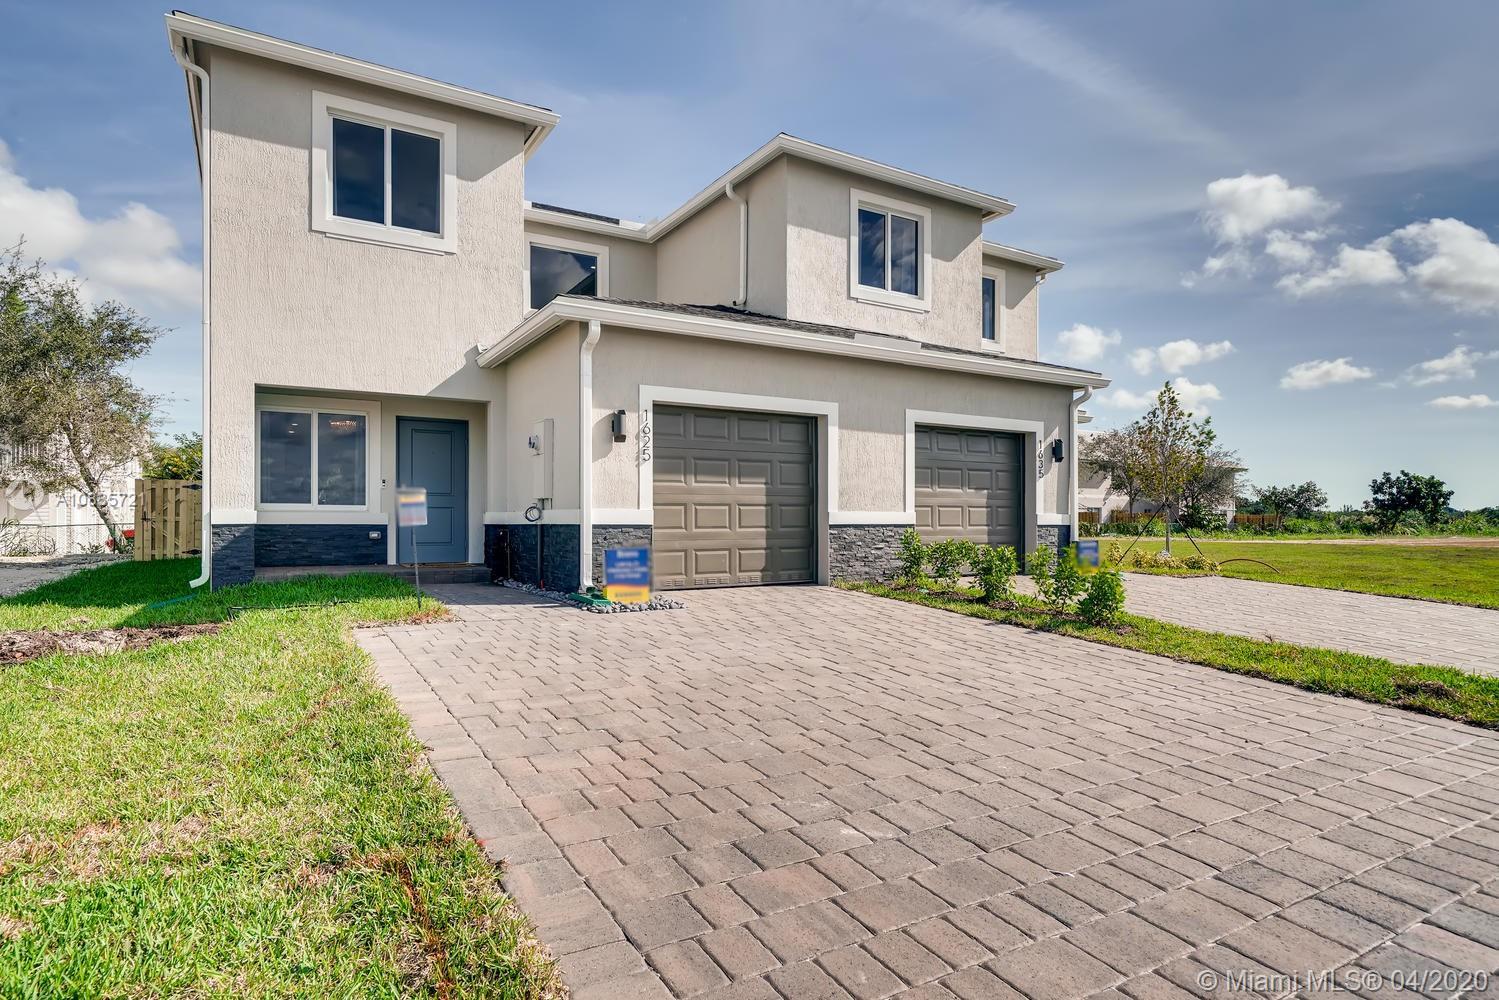 1815 SE 8 PL, Homestead, FL 33034 - Homestead, FL real estate listing